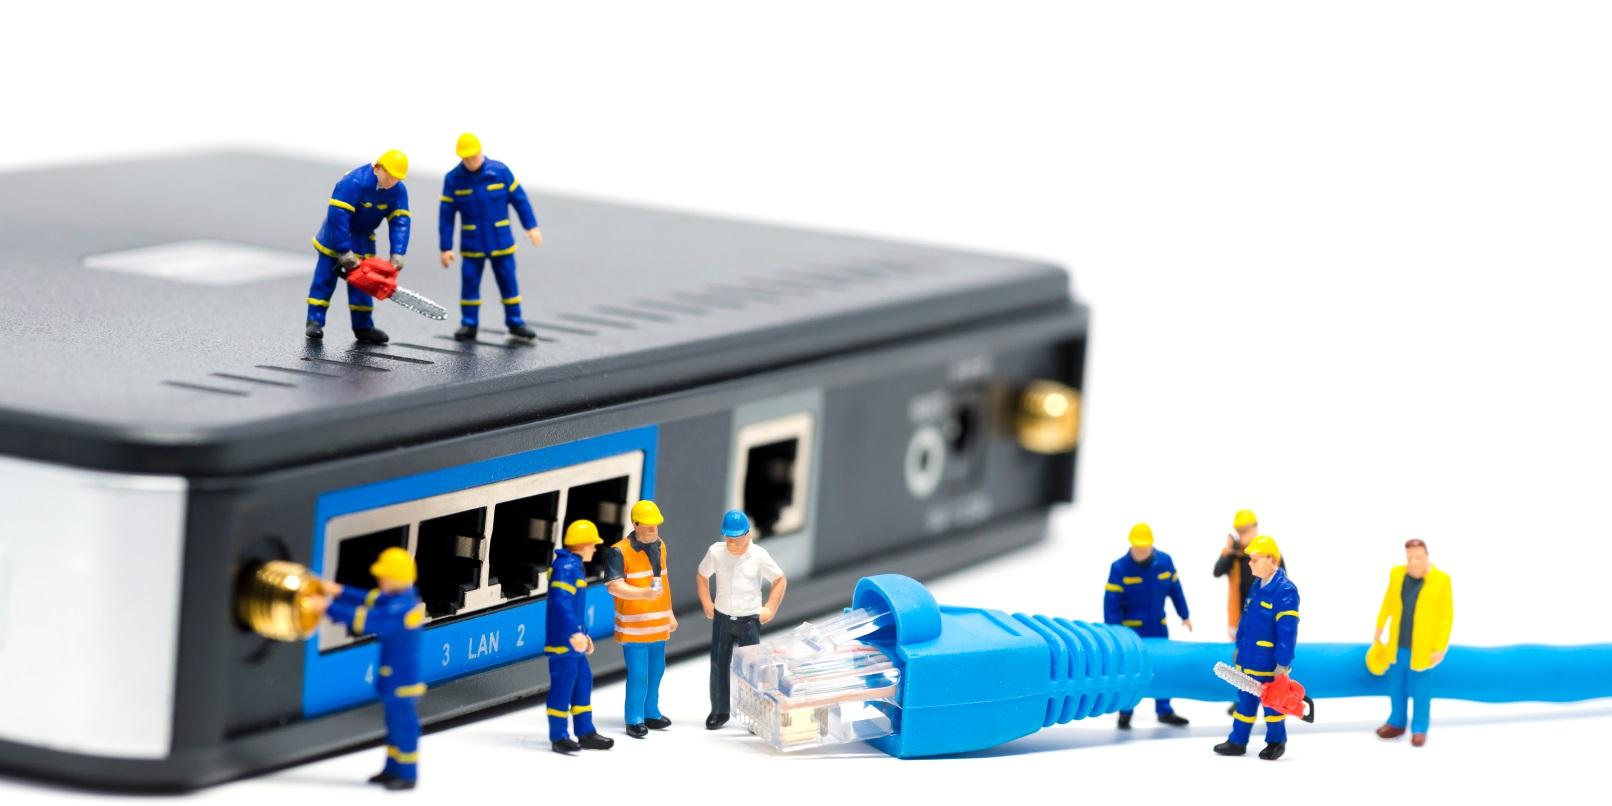 The war over broadband